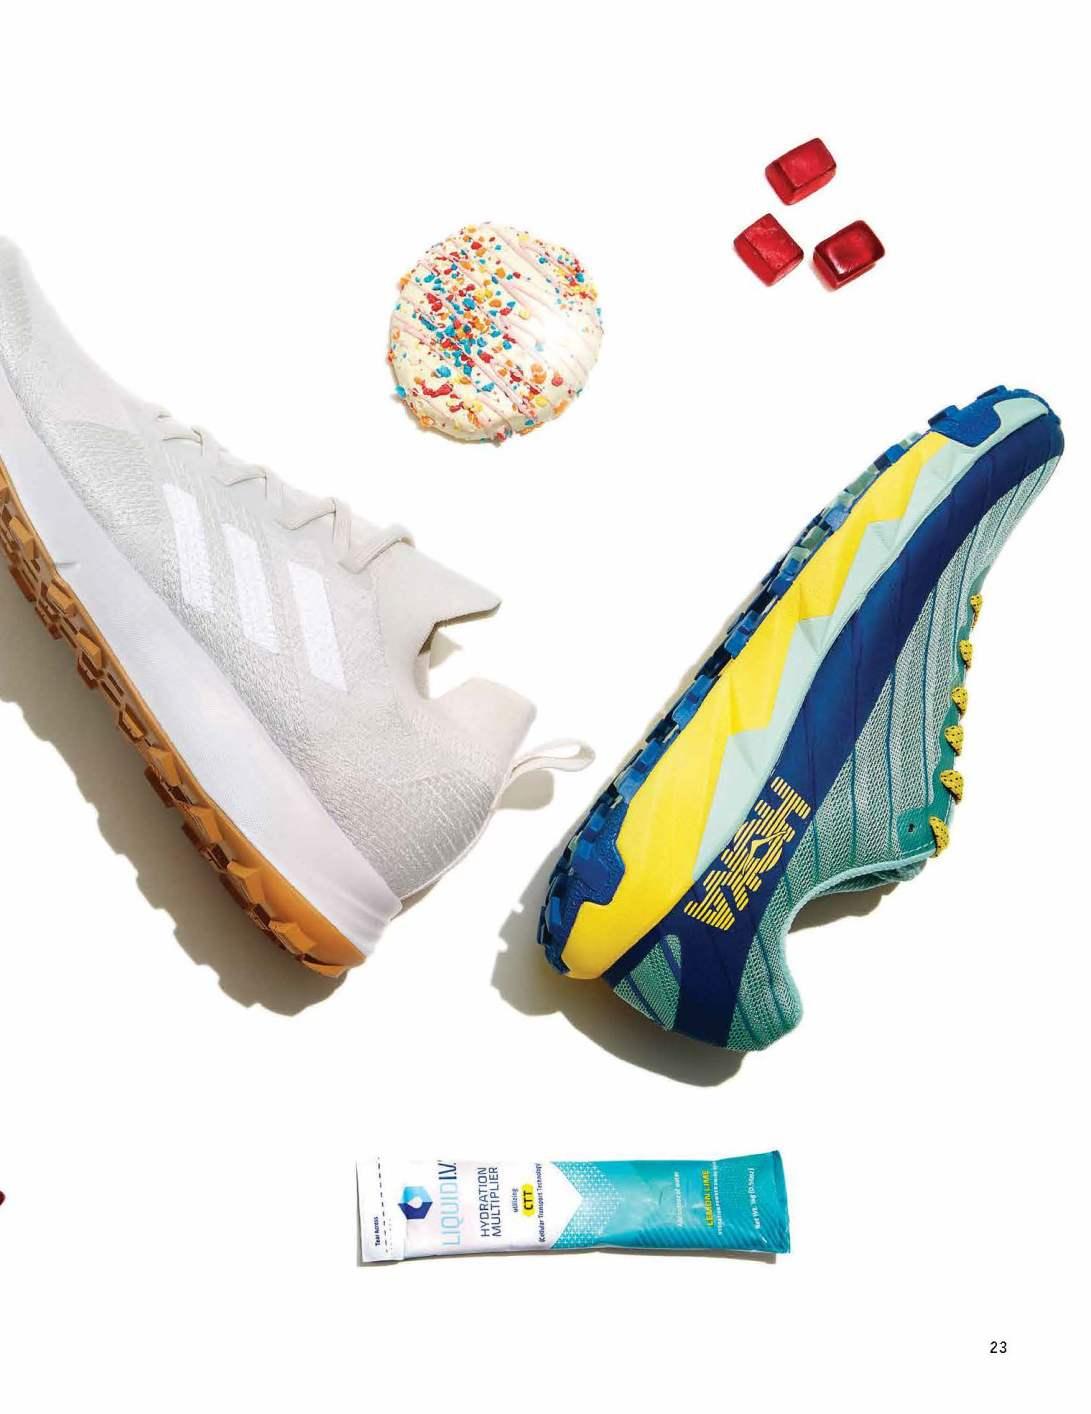 footwear news, trail runners